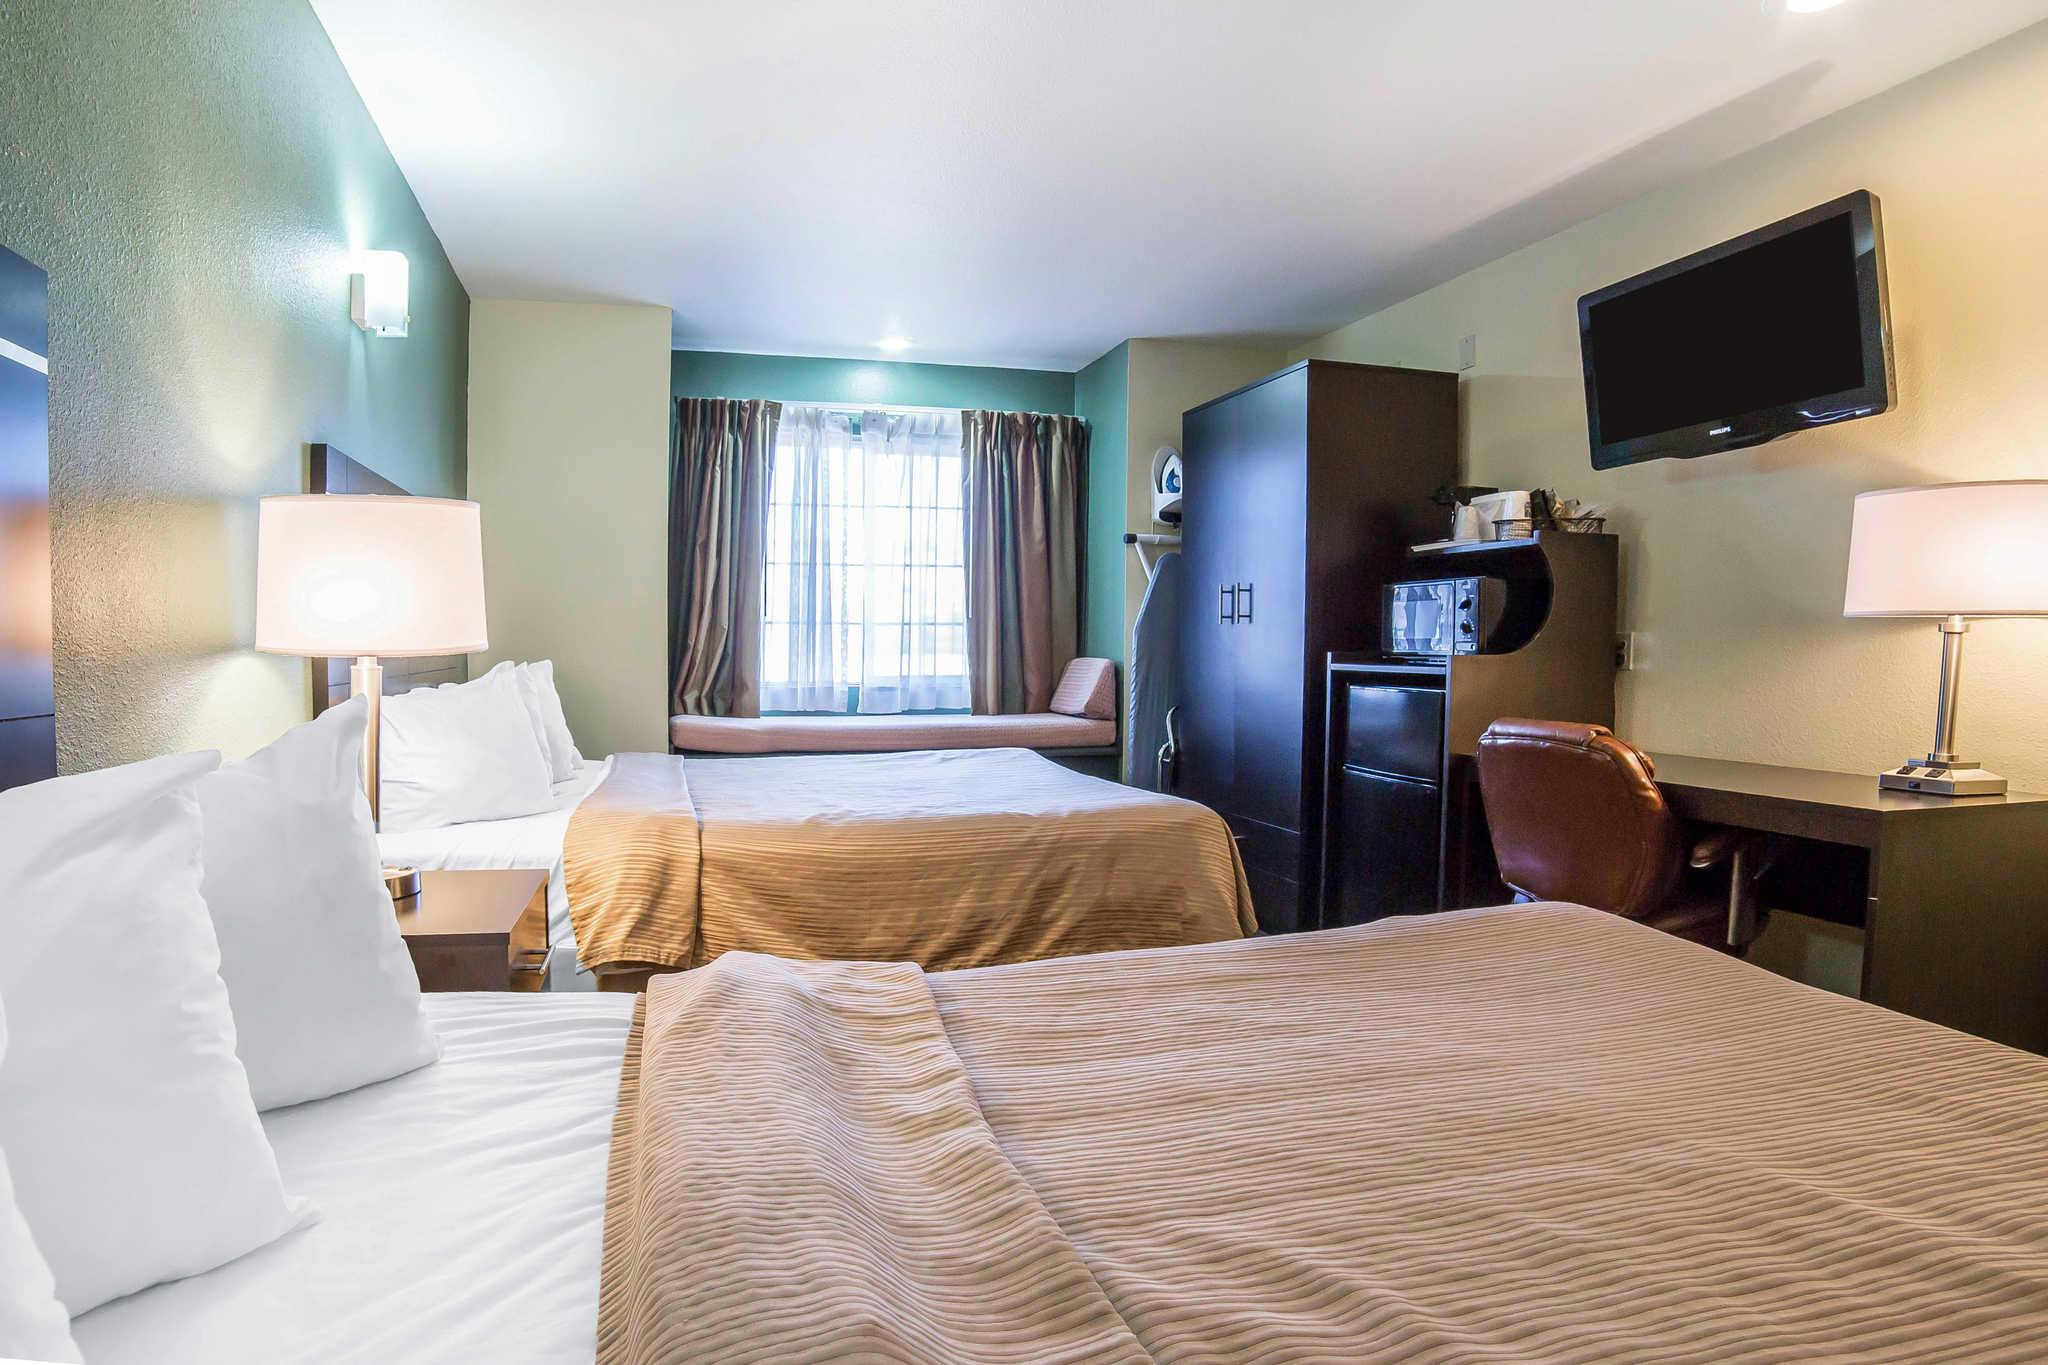 Quality Inn & Suites Elko image 15